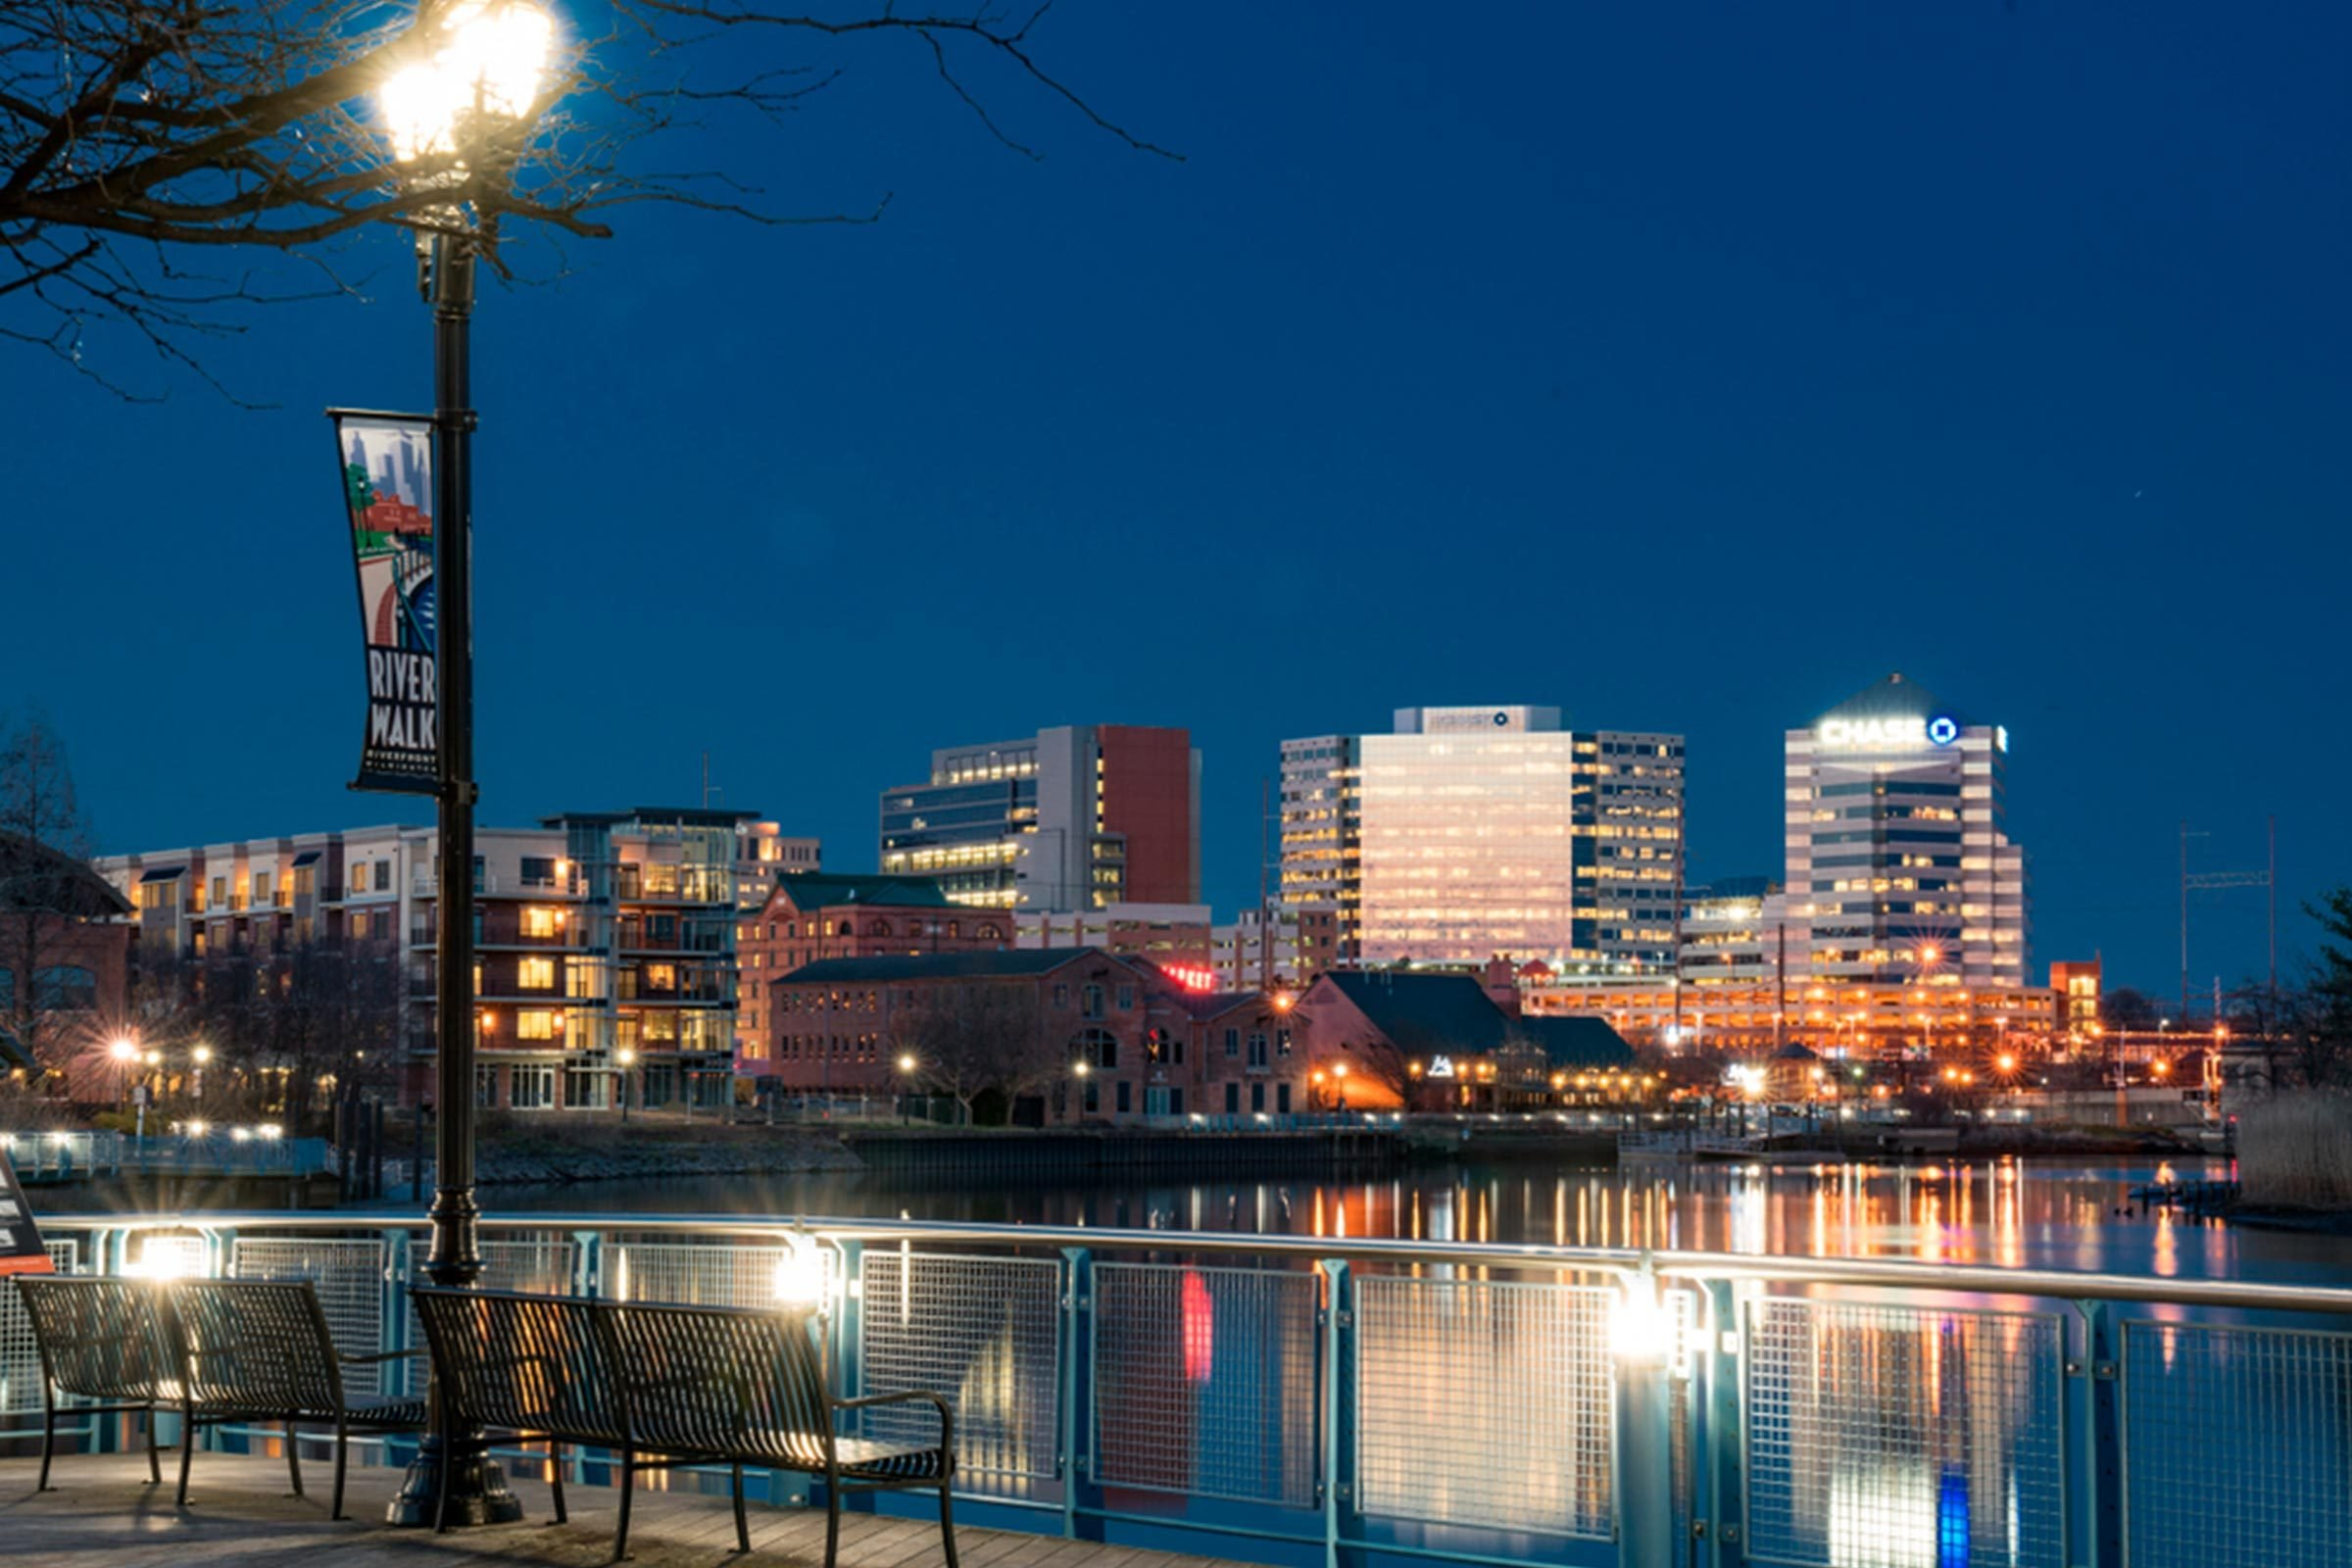 Delaware Wilmington